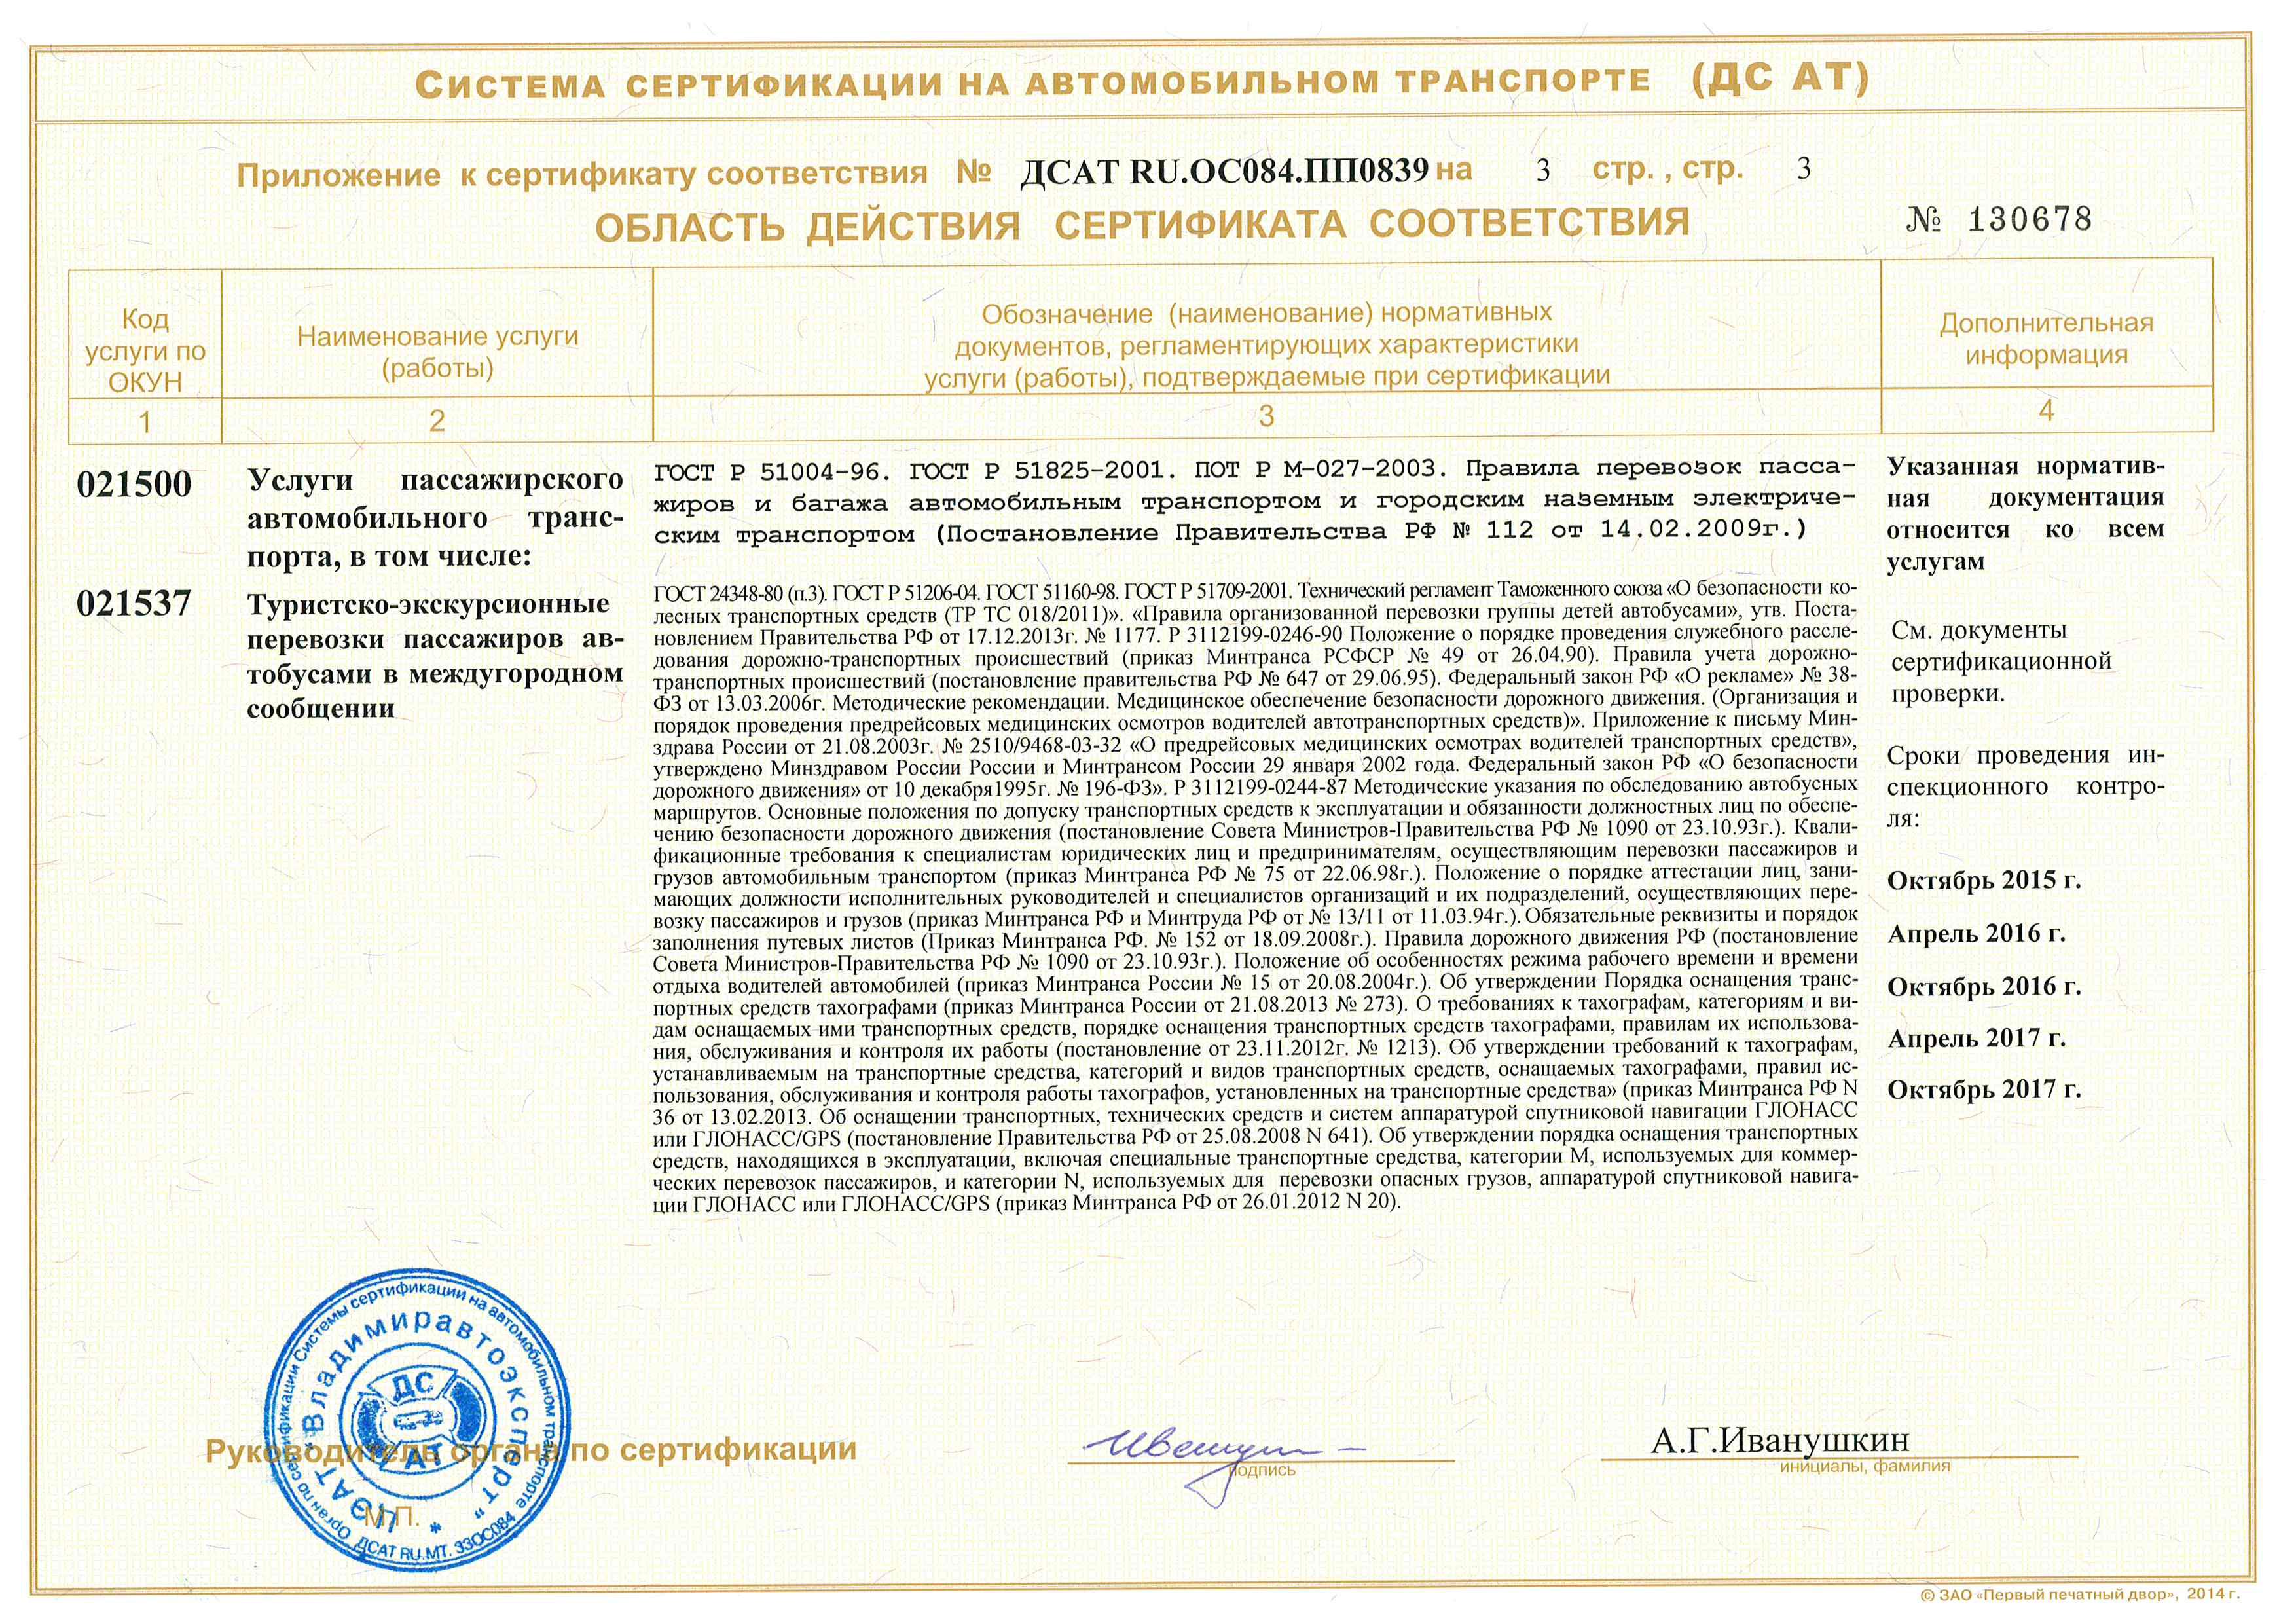 Агентство праздников аврора кострома